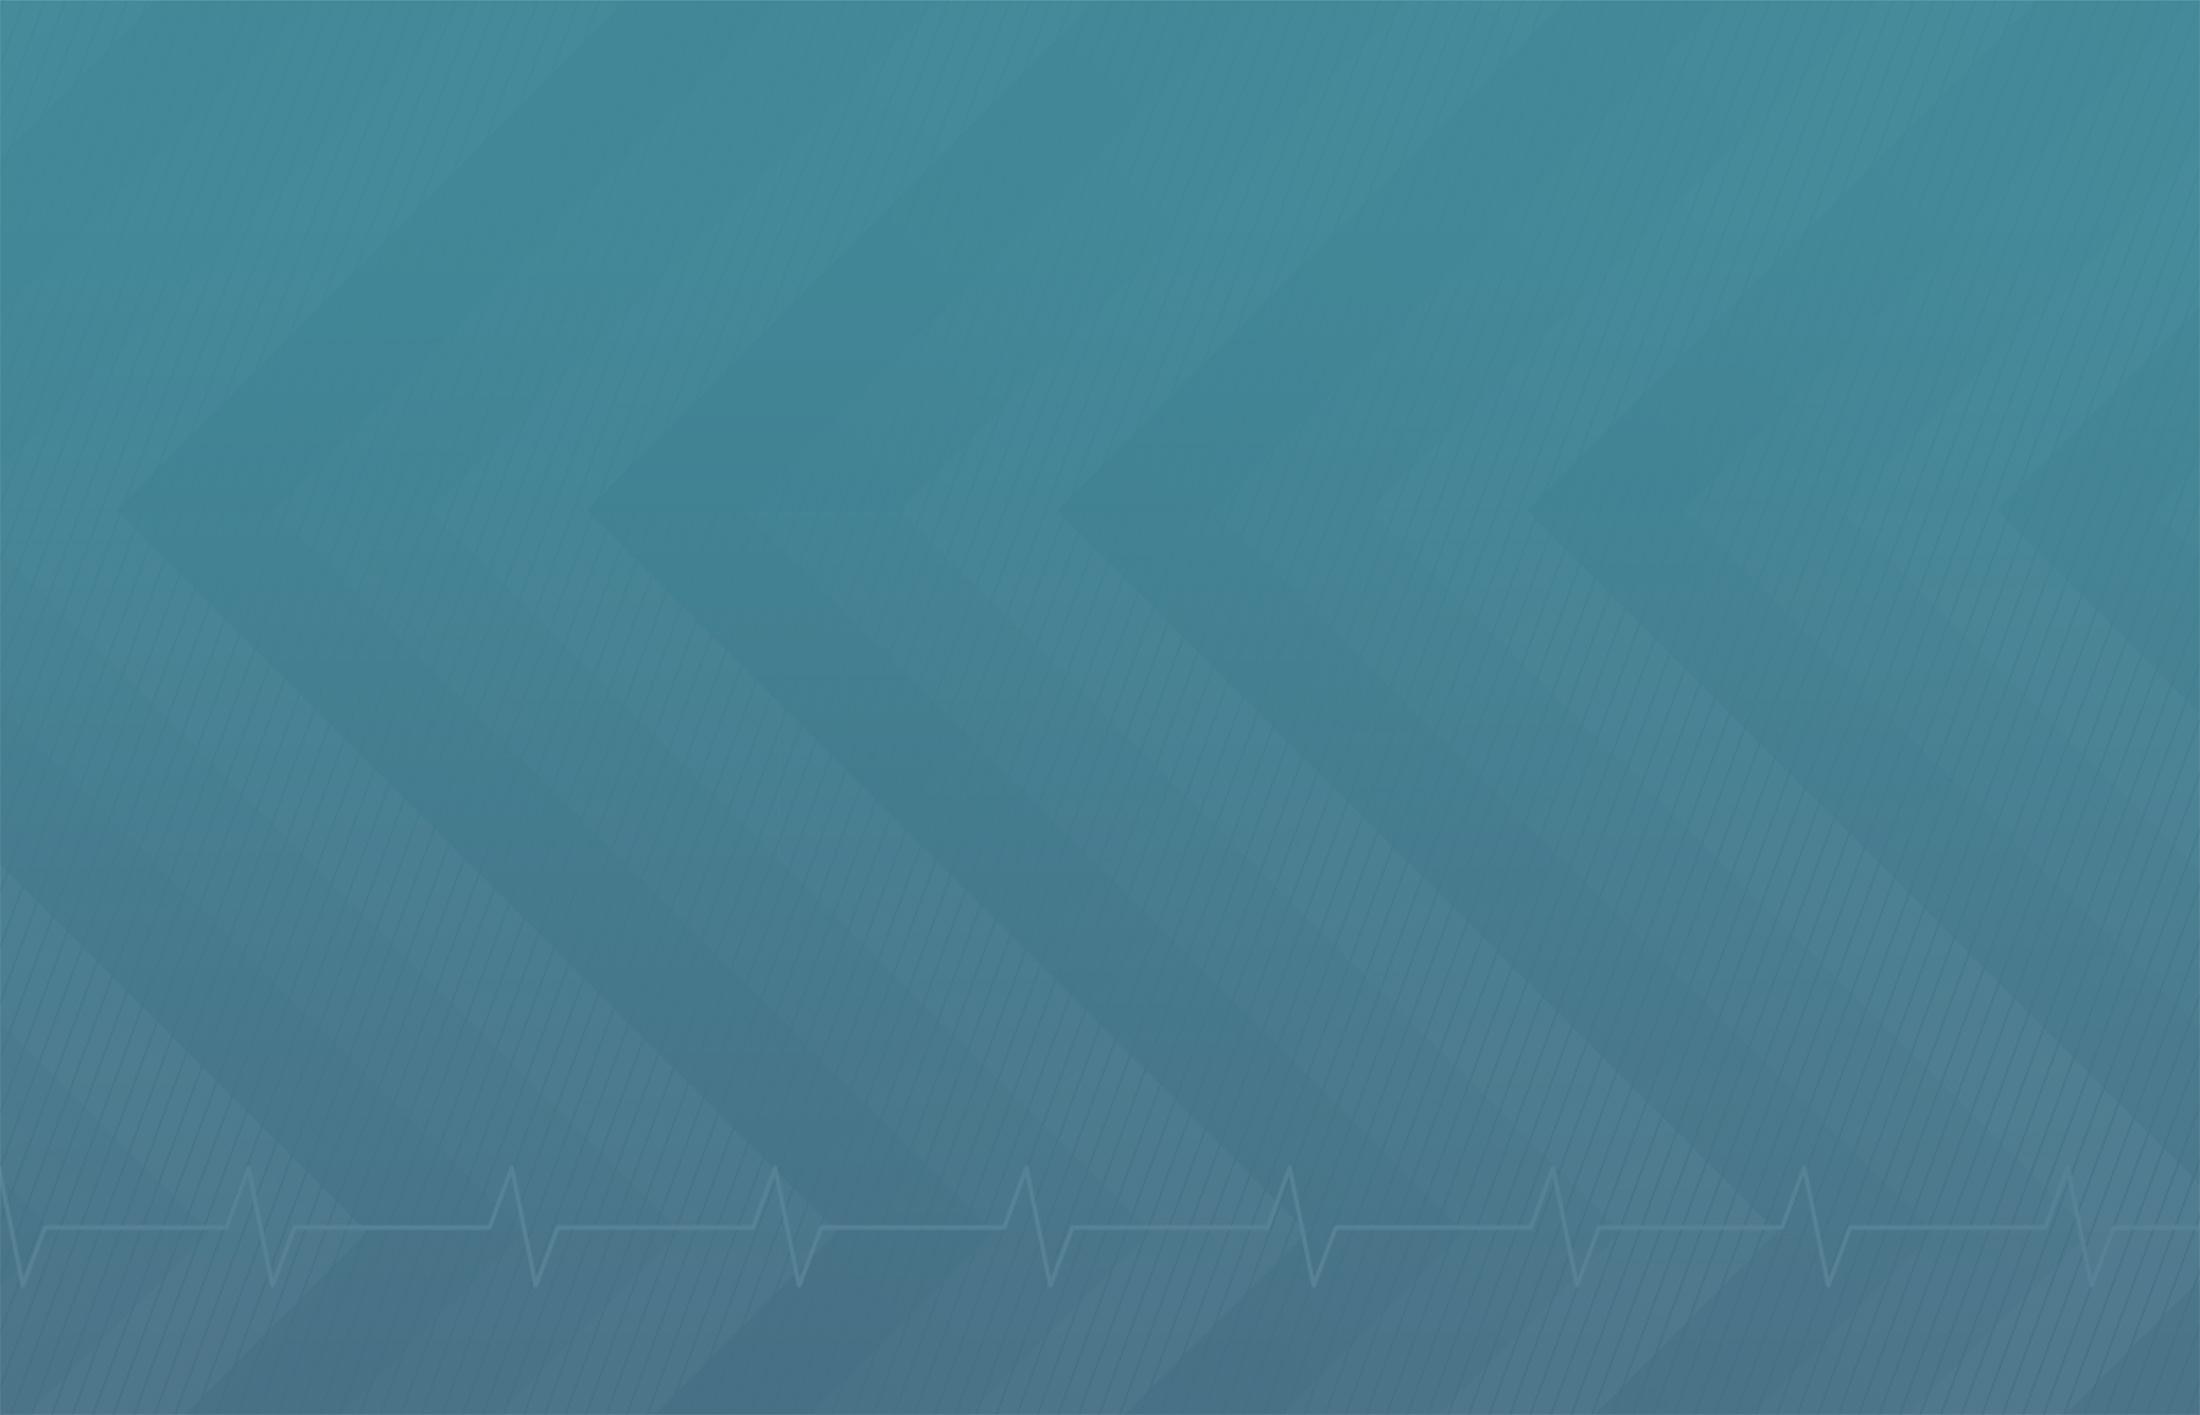 Fitbit Aktivitätstracker Charge Hr App : Fitbit charge hr im test fitness tracker mit pulssensor techstage